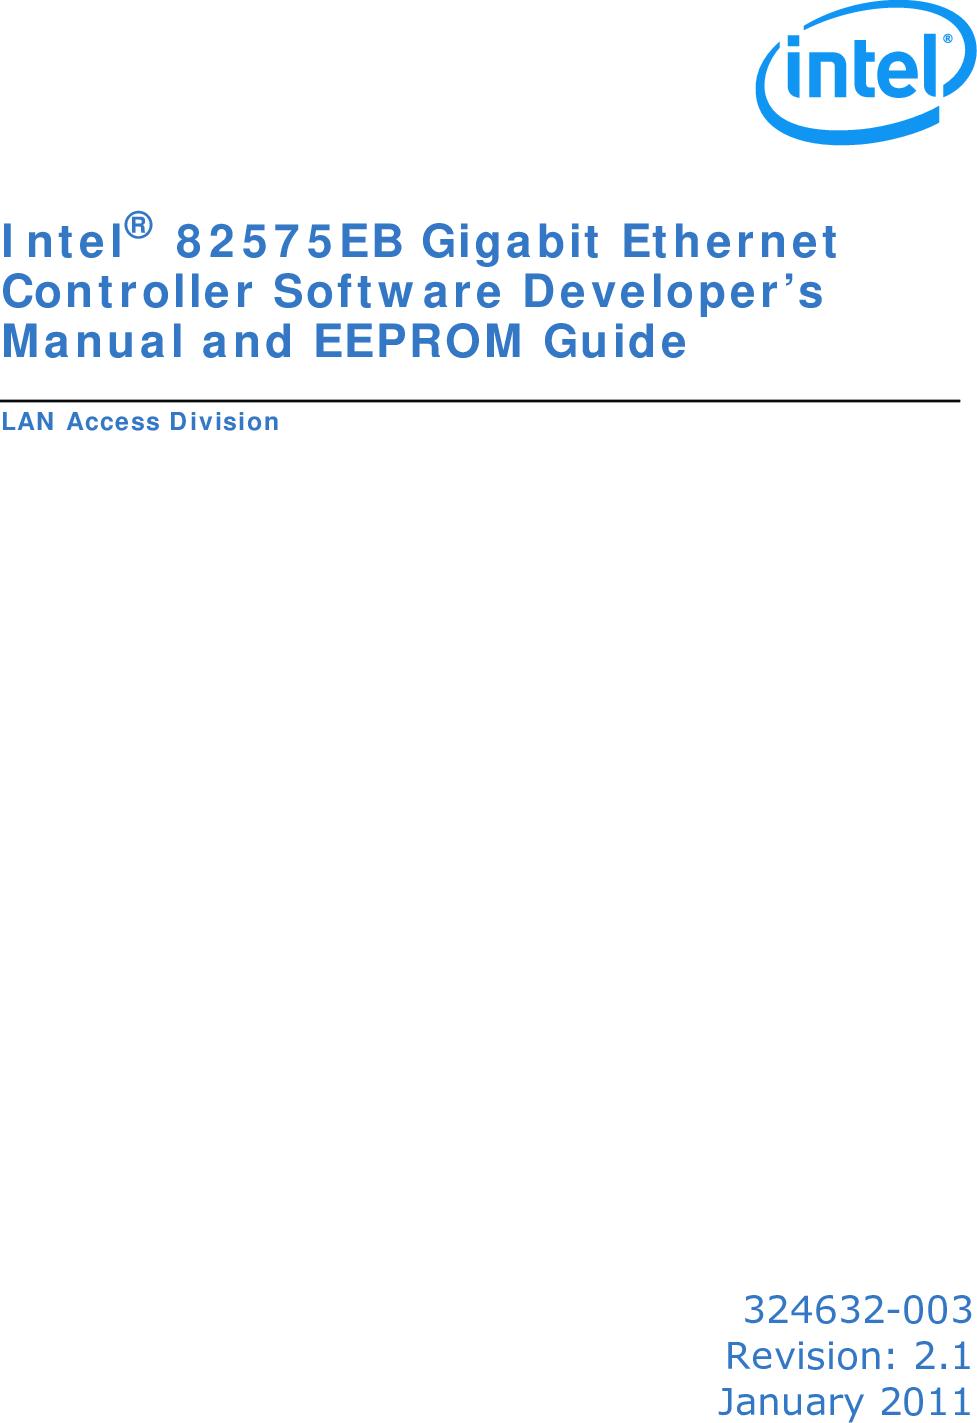 Intel 324632 003 Intel® 82575EB Gigabit Ethernet Controller